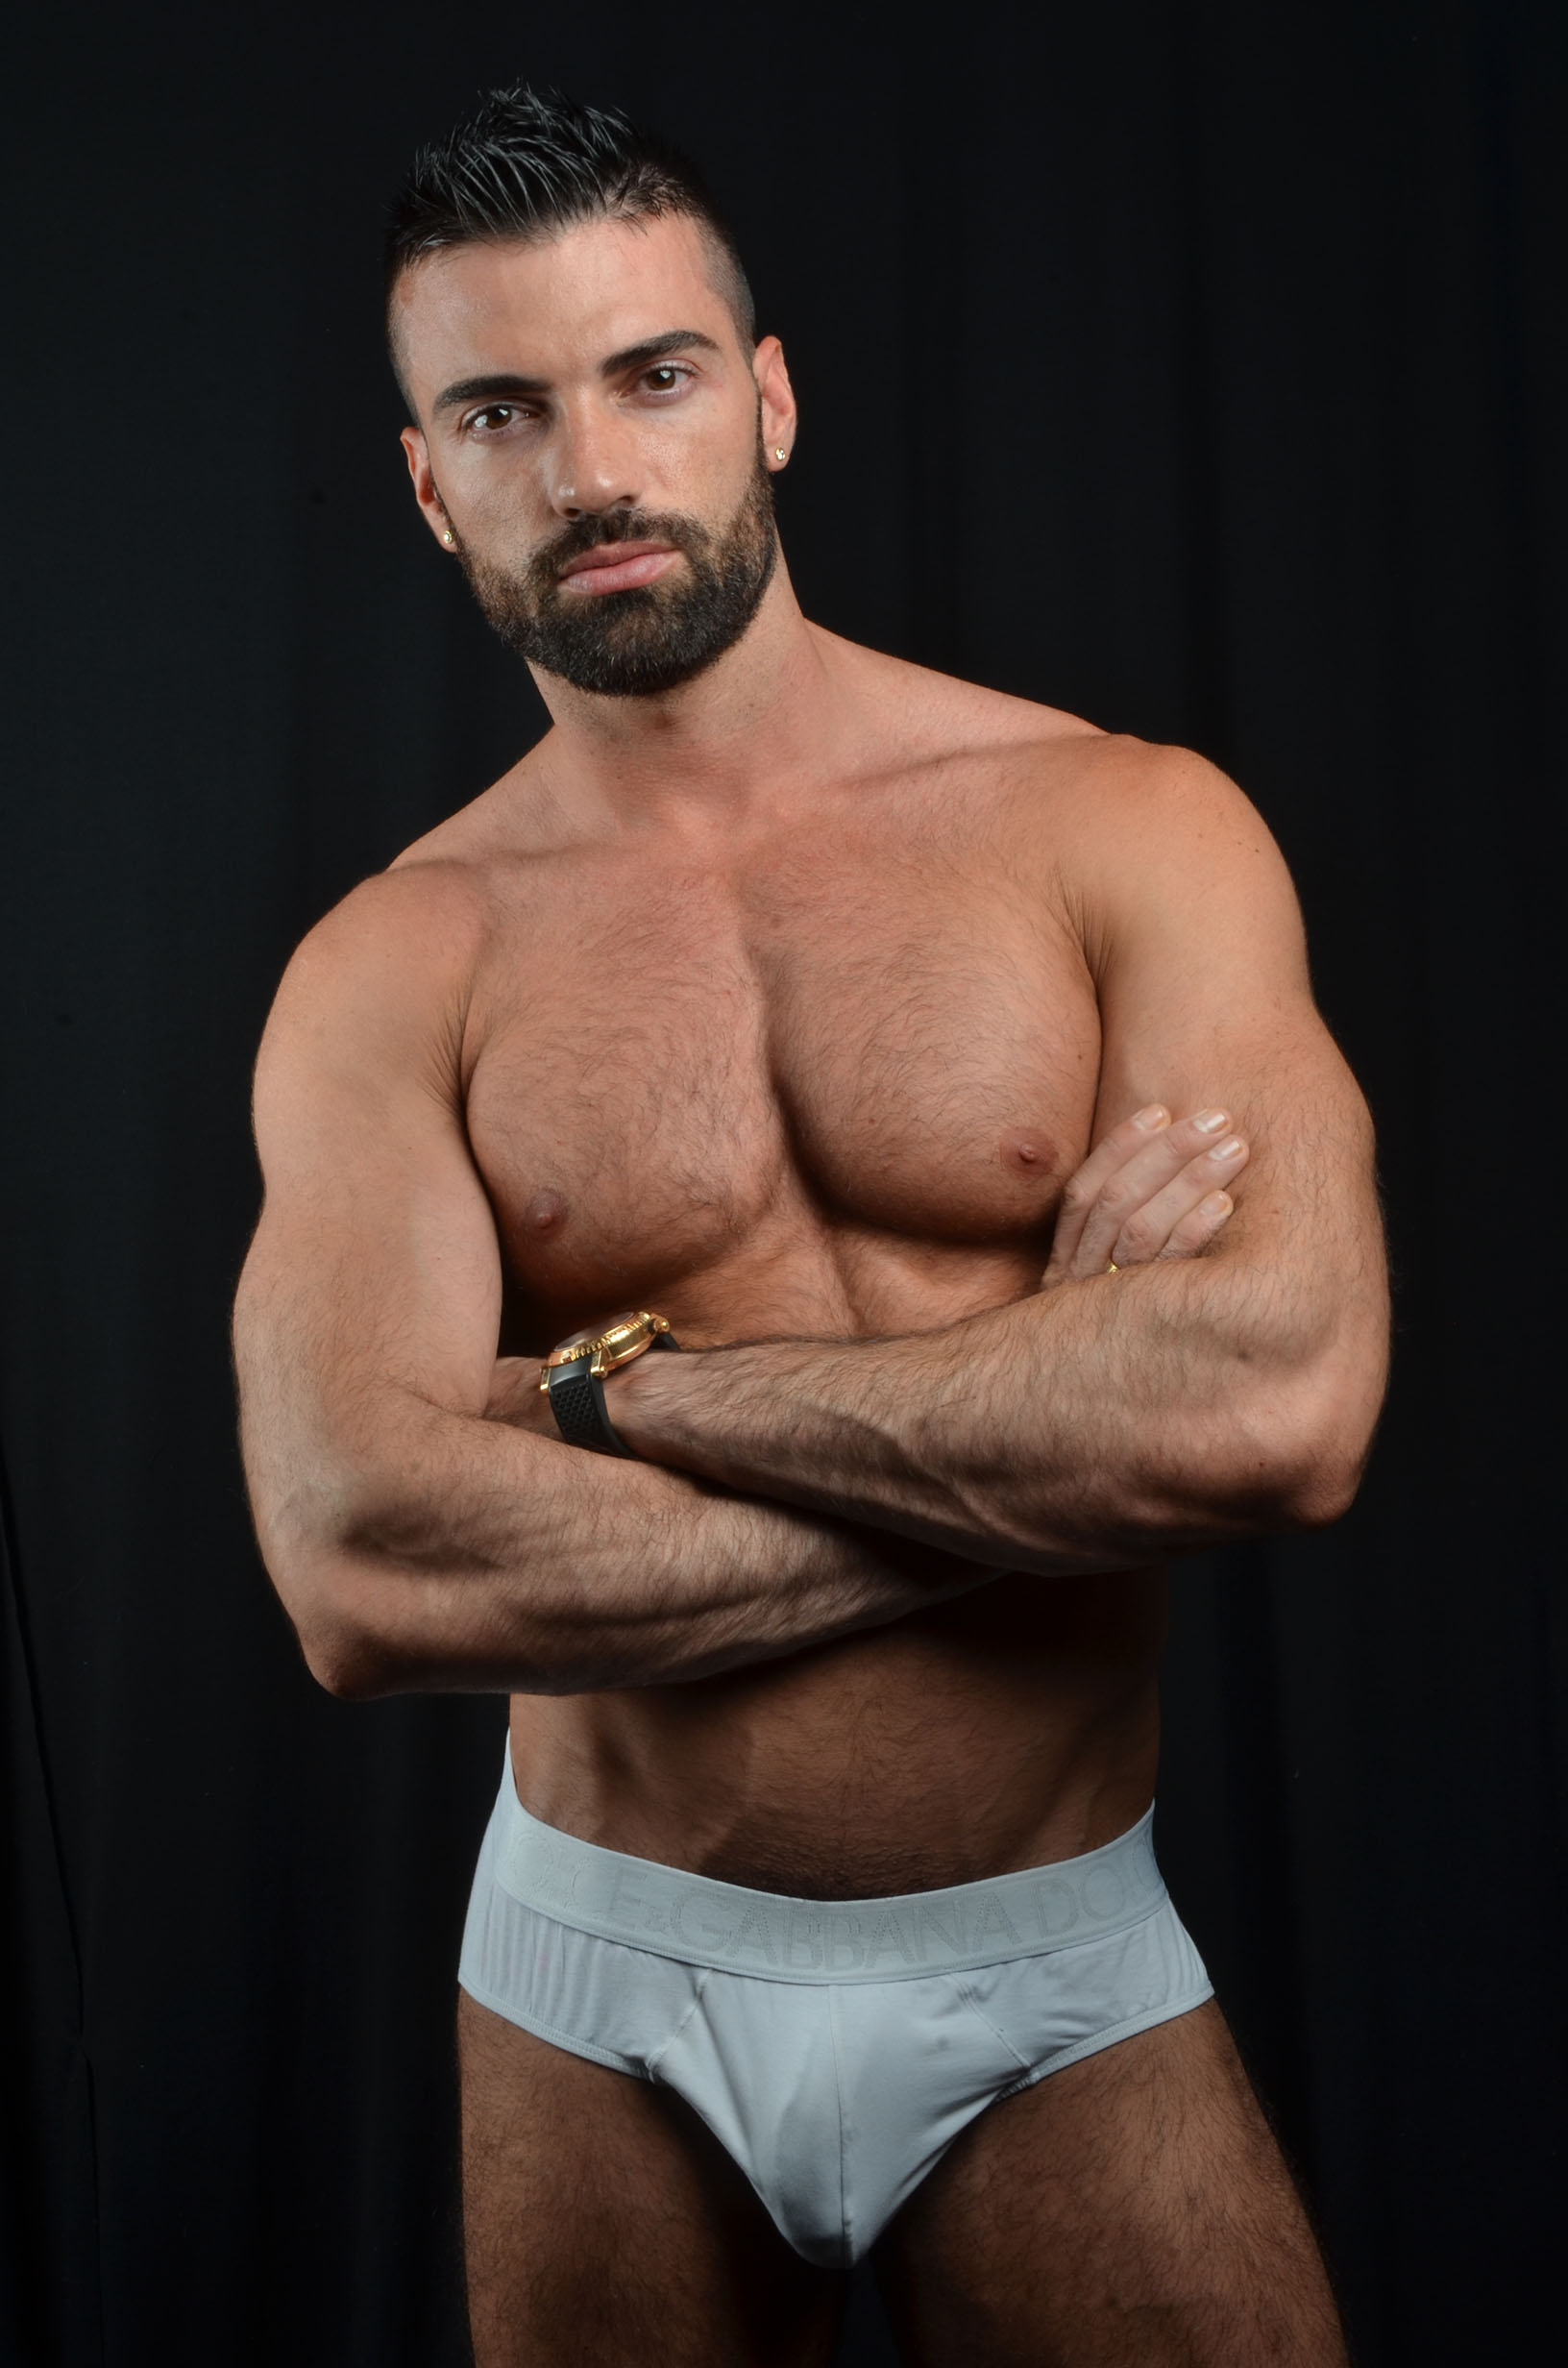 Men nude photo with long hair penis uncut